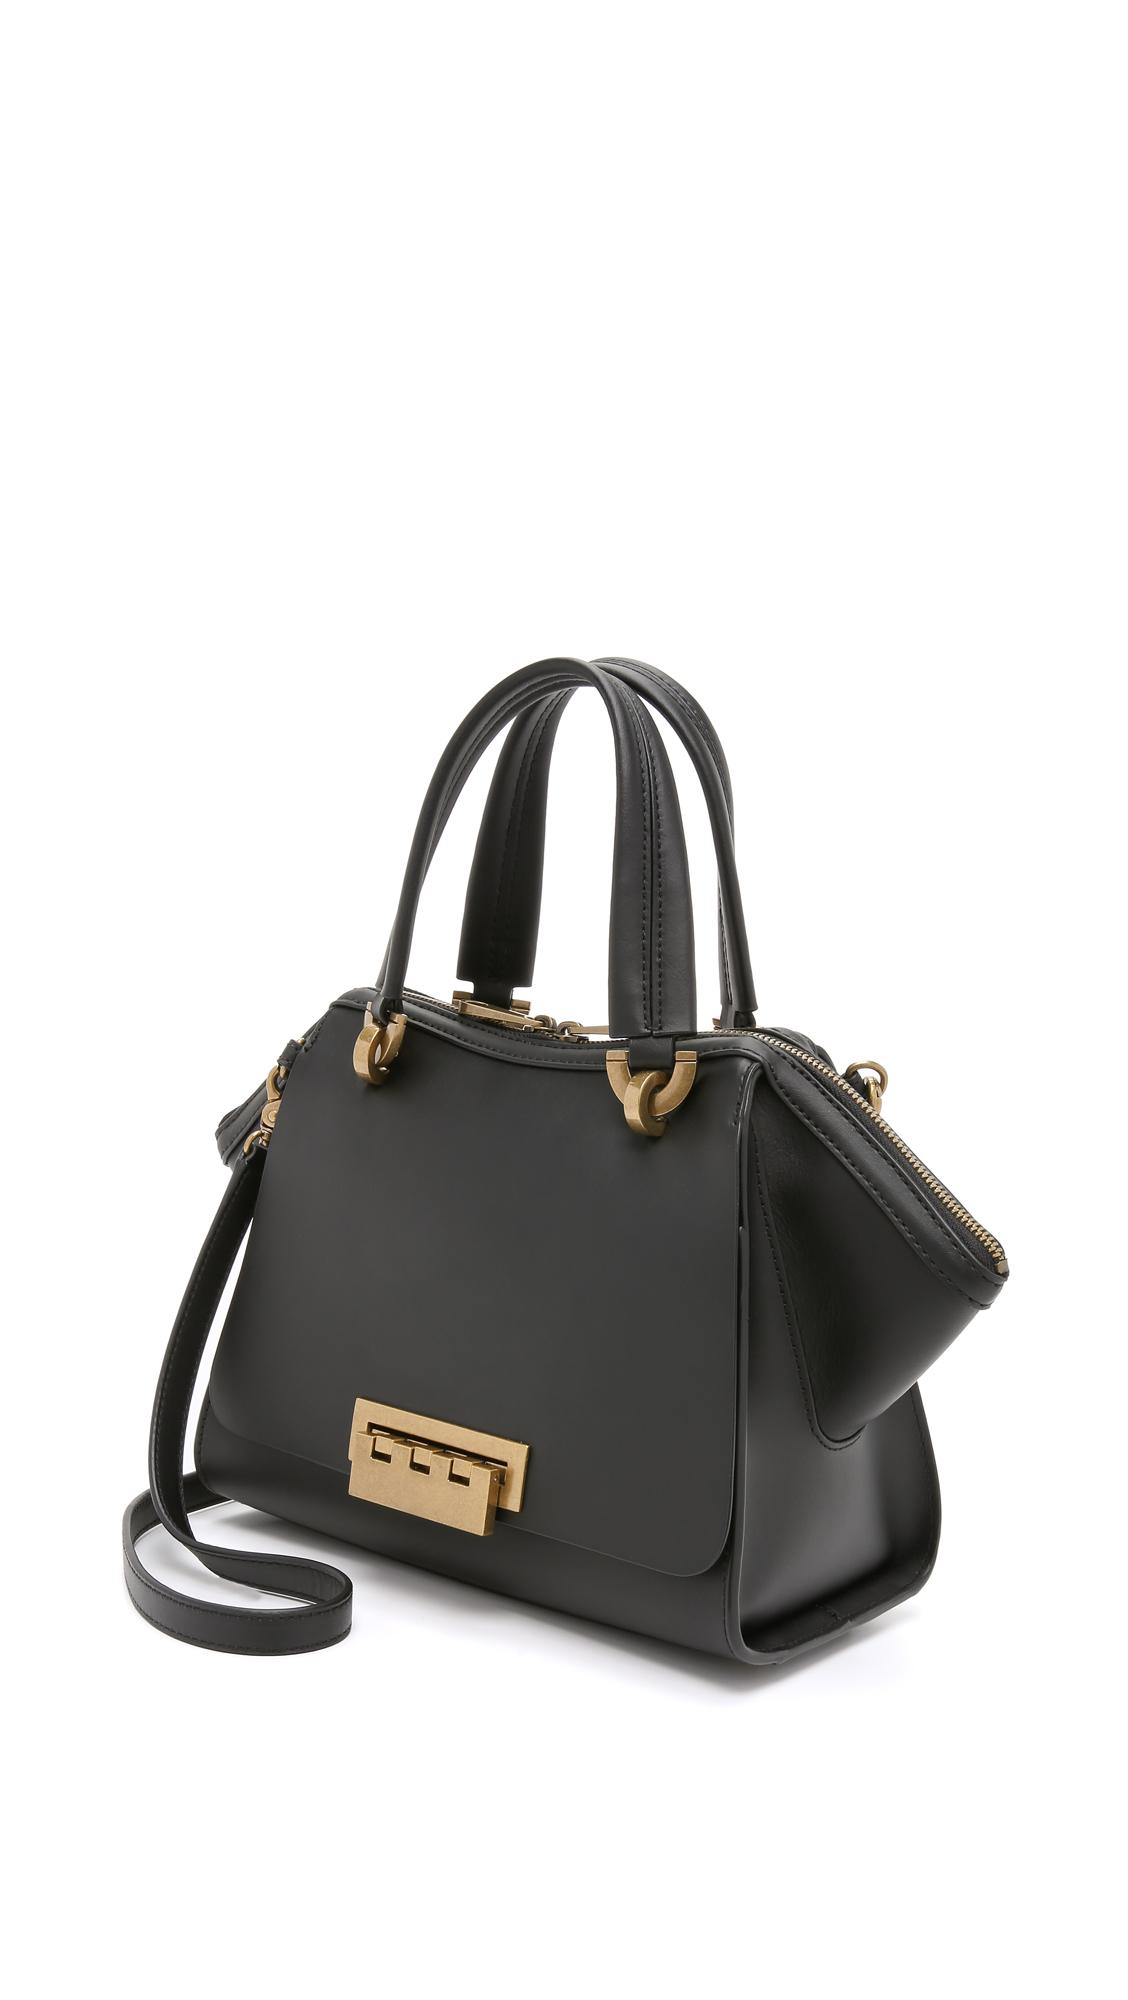 c3a5bd934bbd Small Black Handbag With Handle - Handbag Photos Eleventyone.Org